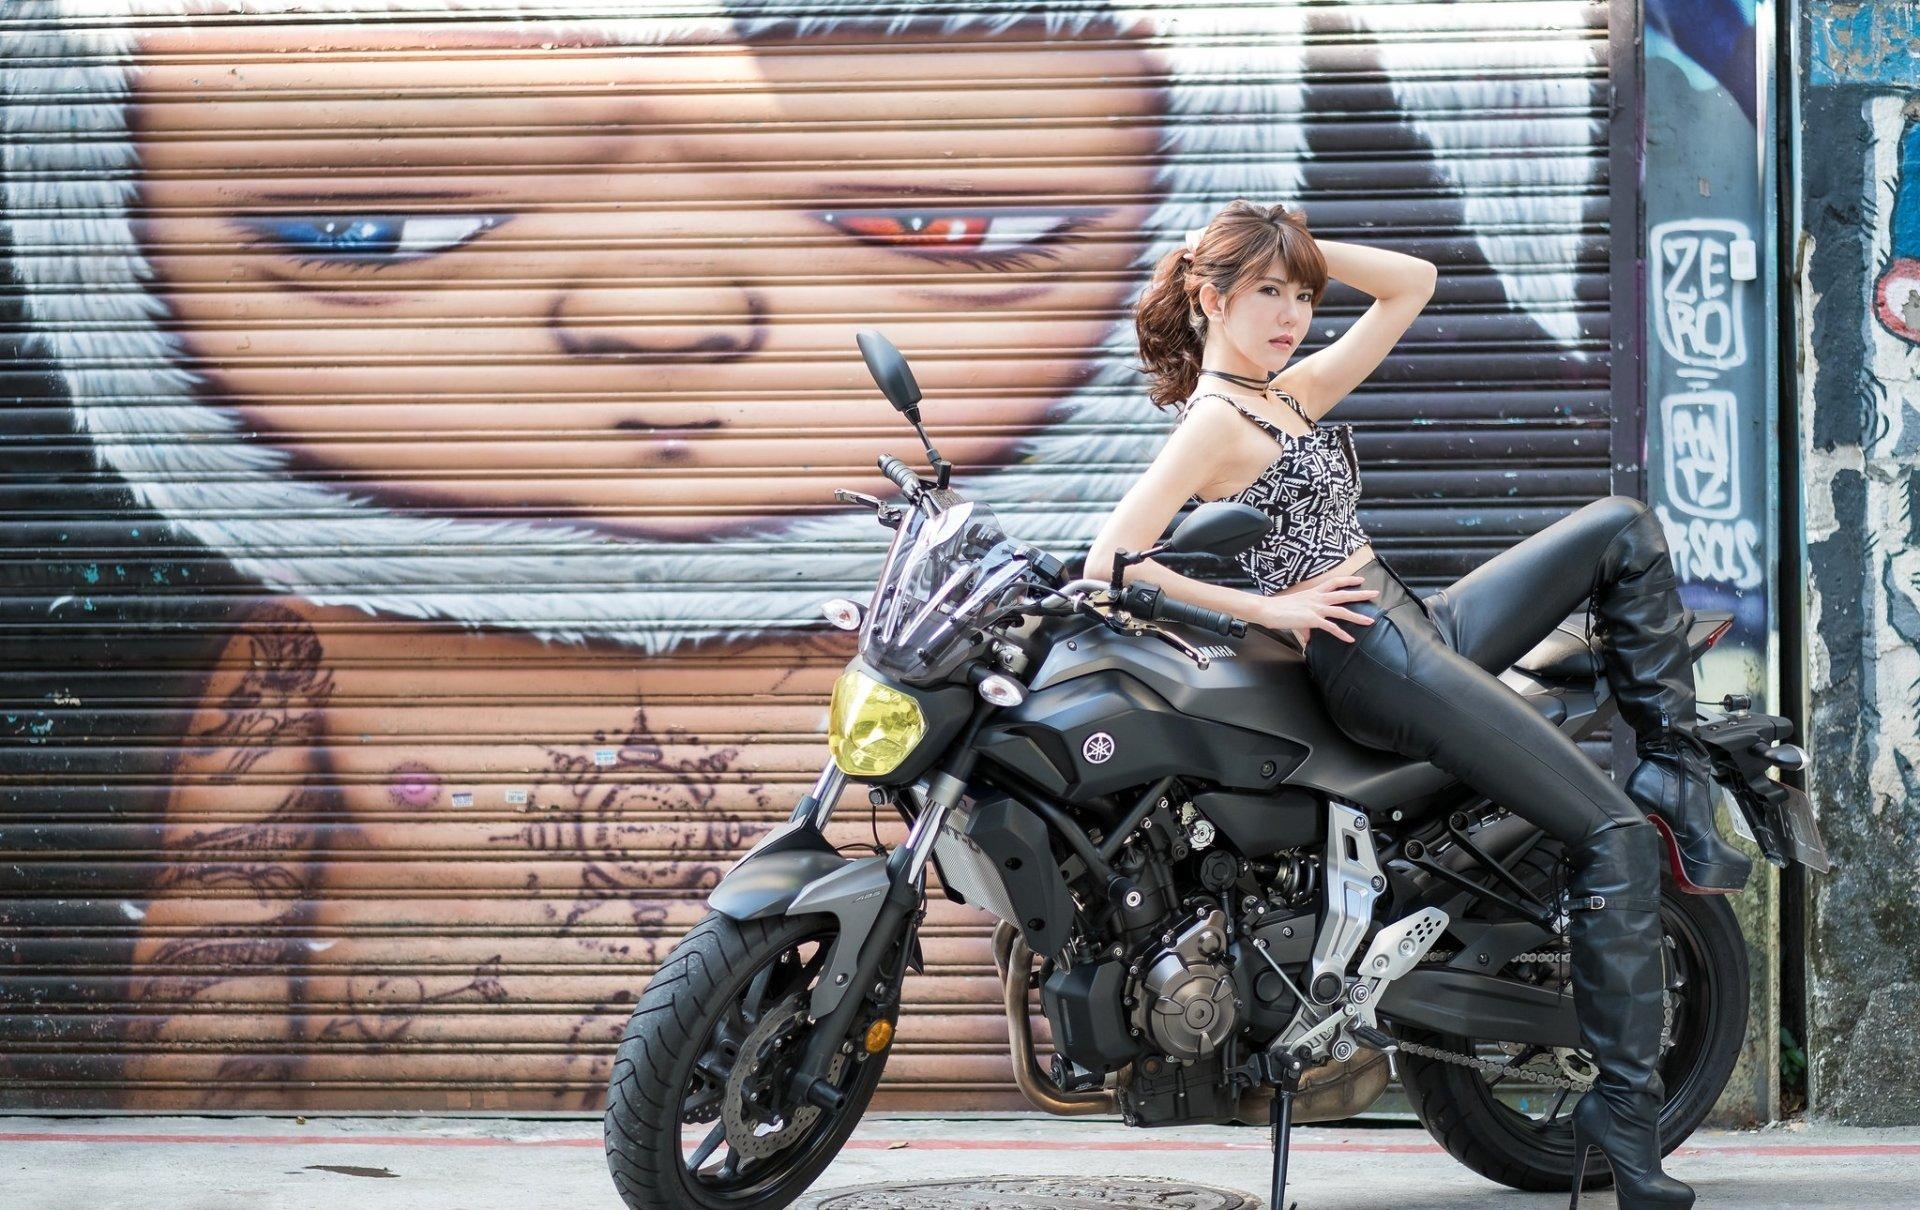 Motorcycle Girl Wallpaper: Girls & Motorcycles HD Wallpaper